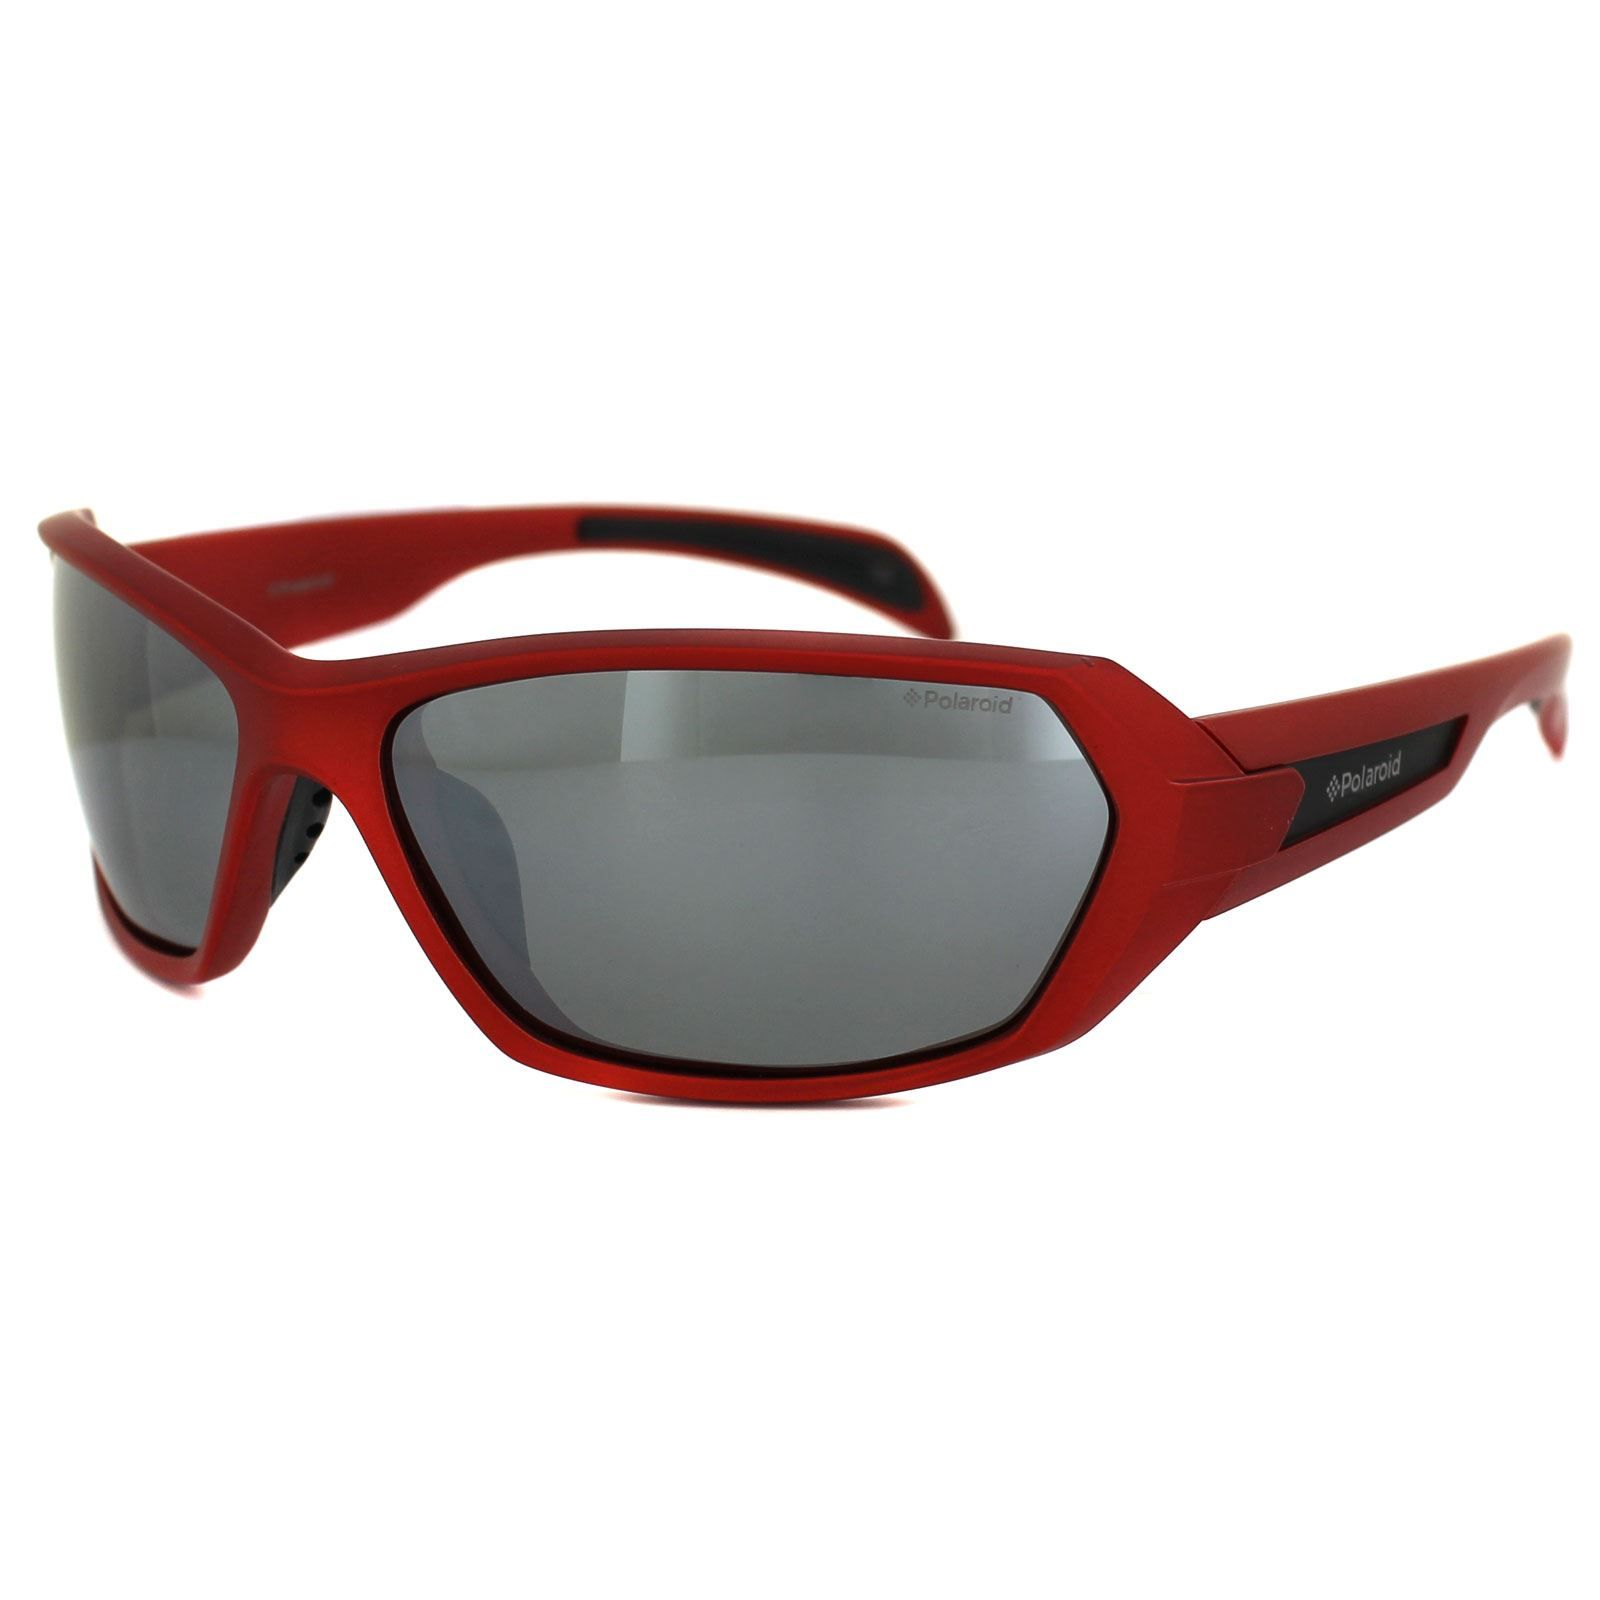 Polaroid Sport Sunglasses P7312 33W JB Shiny Red Grey Silver Mirror Polarized